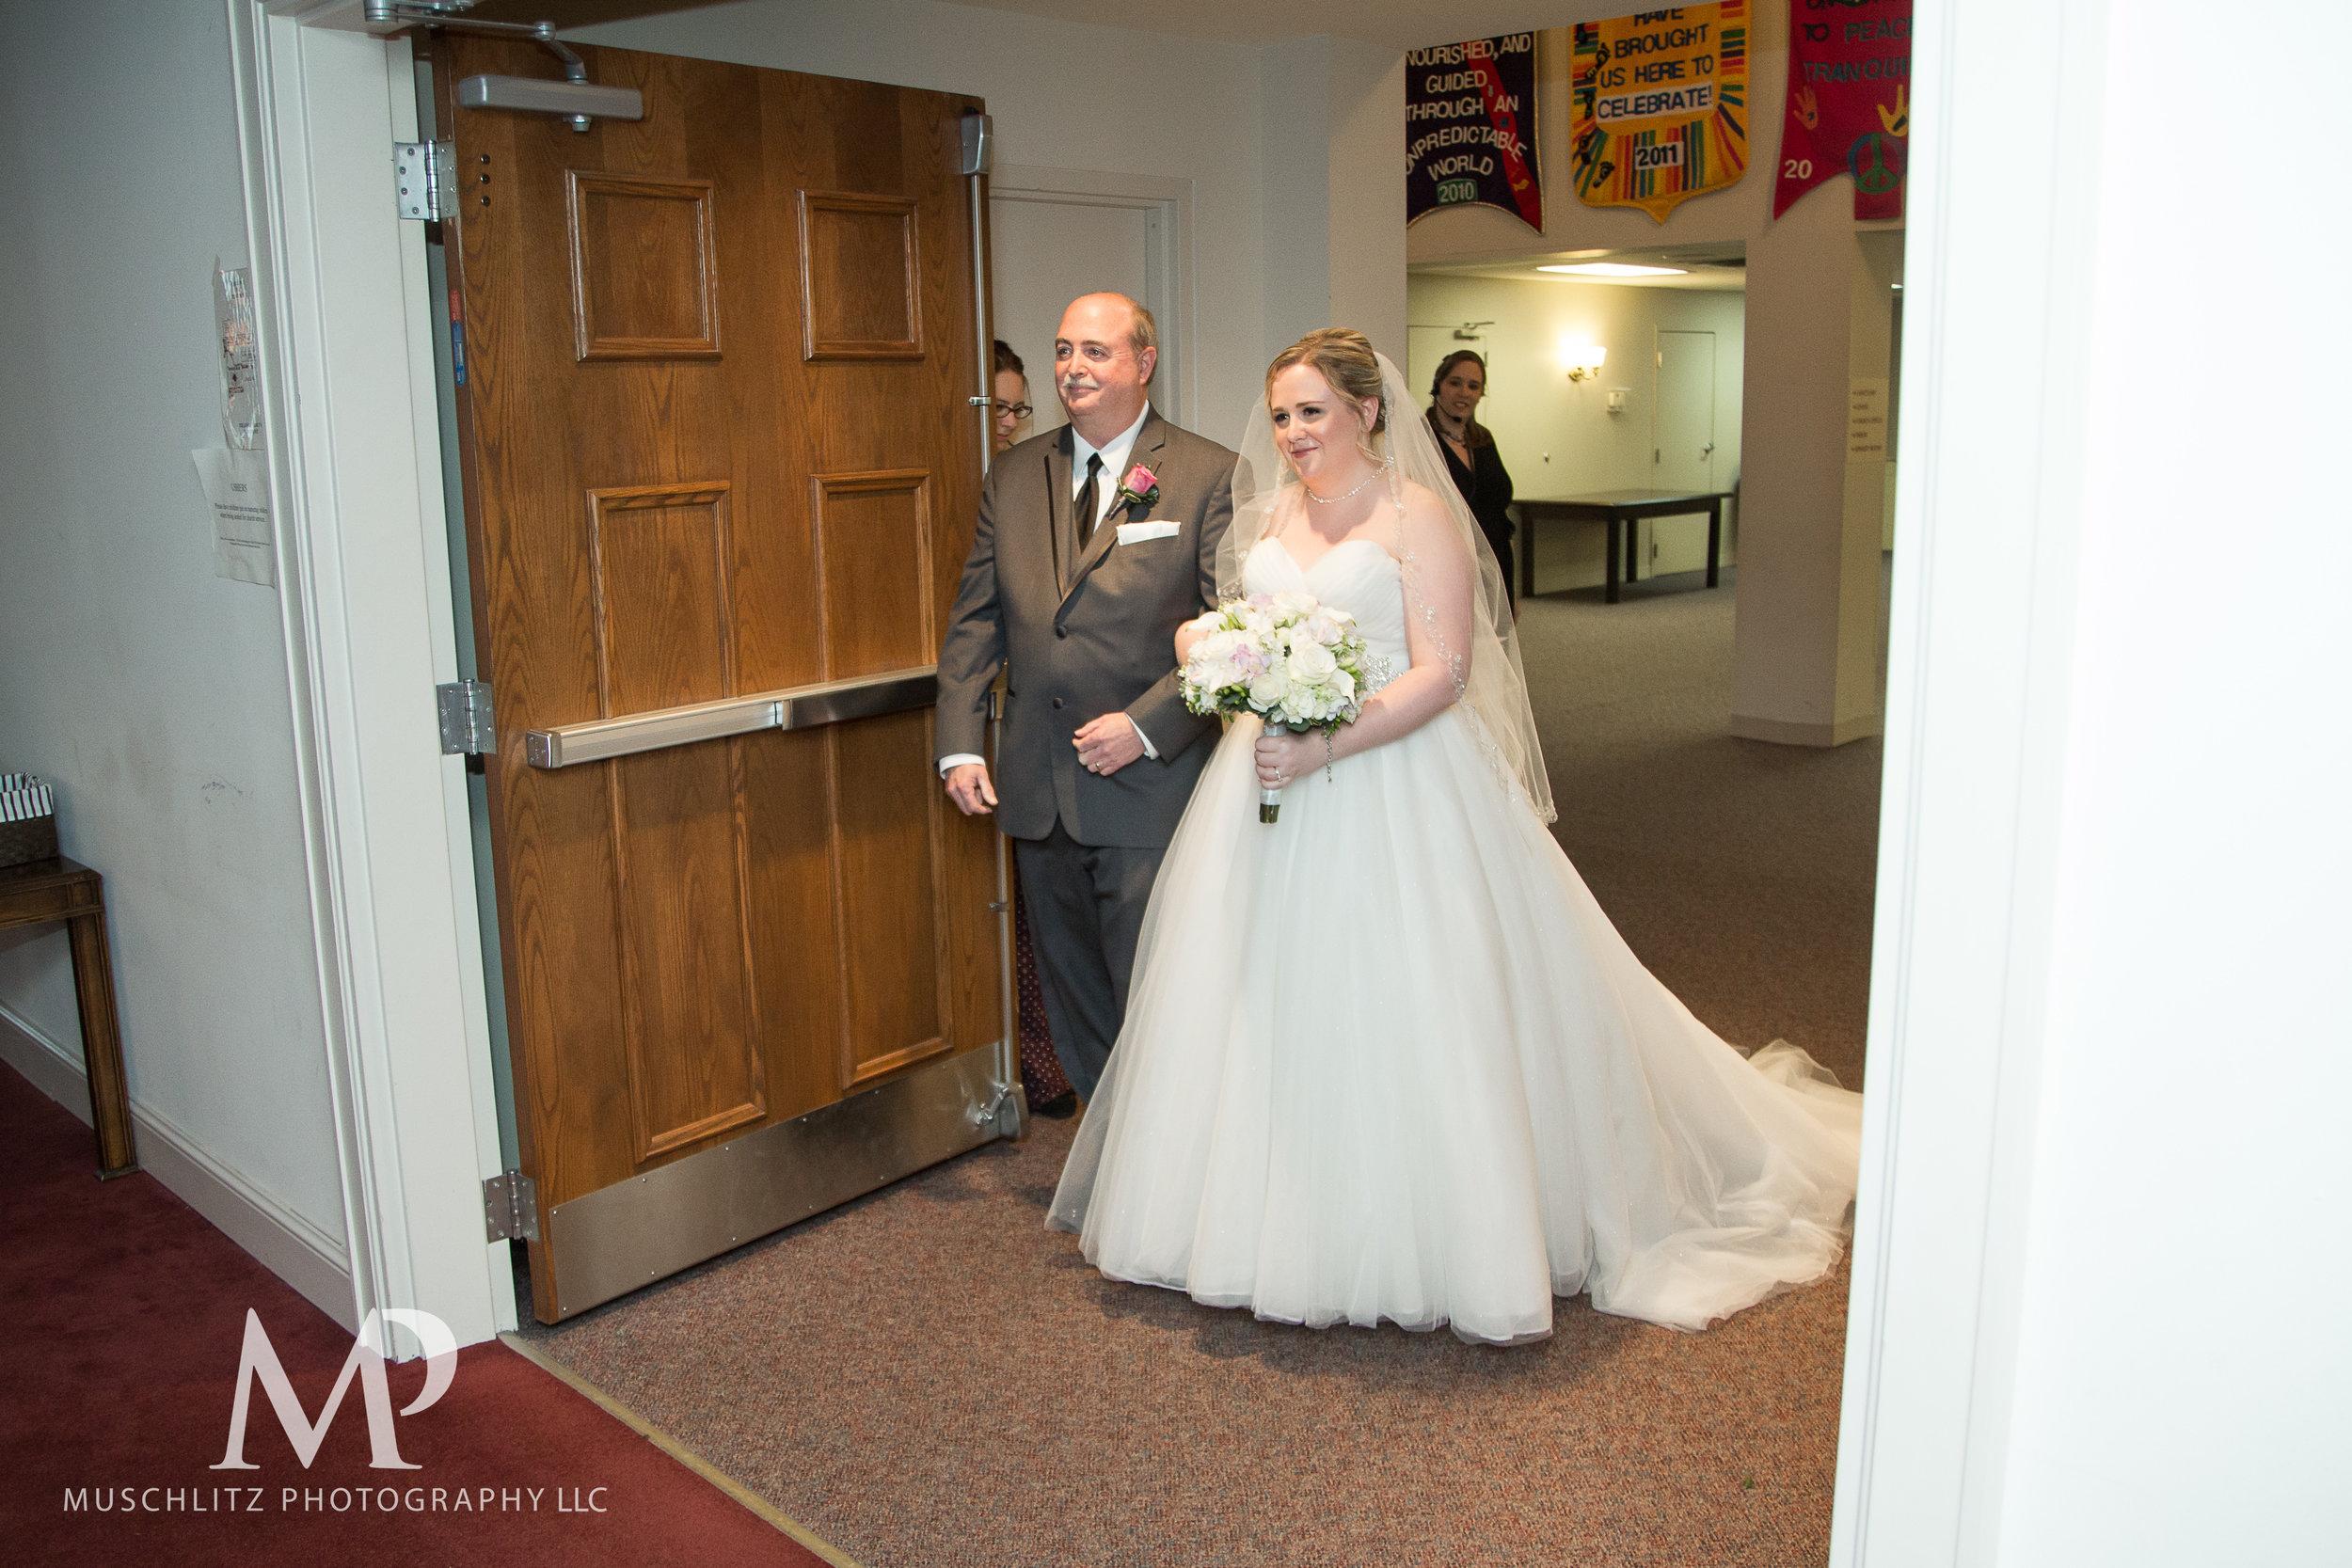 dublin-community-church-wedding-columbus-ohio-muschlitz-photography-031.JPG